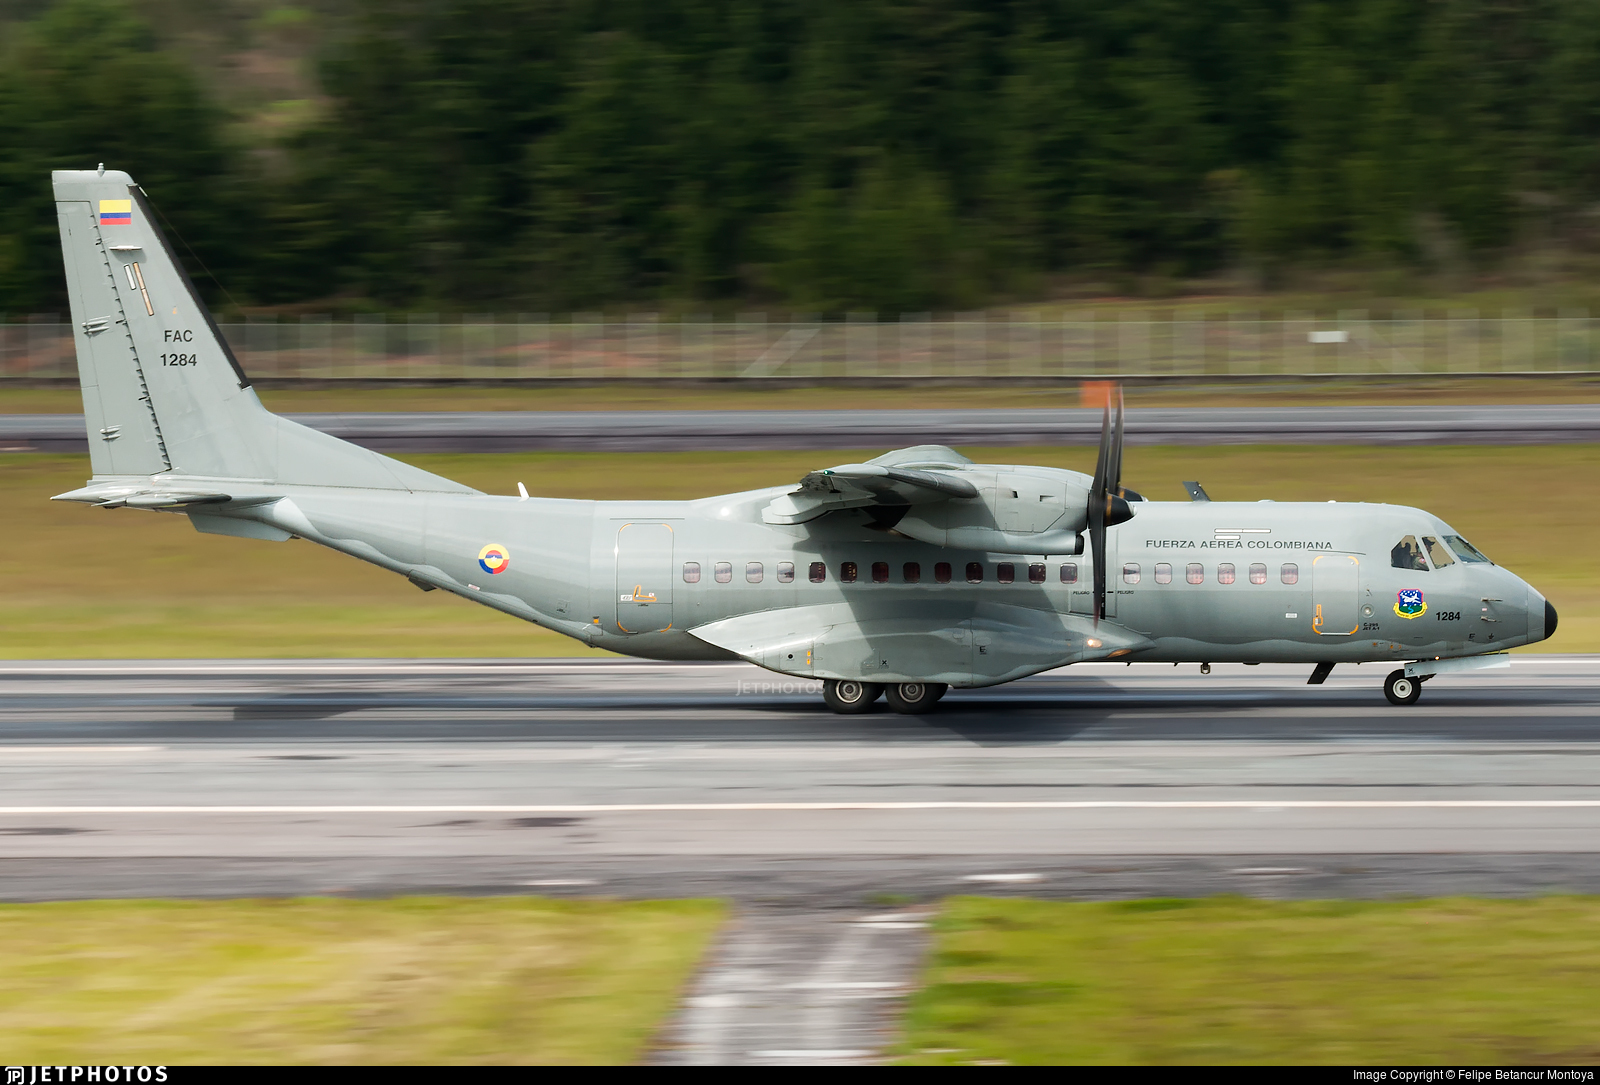 FAC1284 - CASA C-295M - Colombia - Air Force